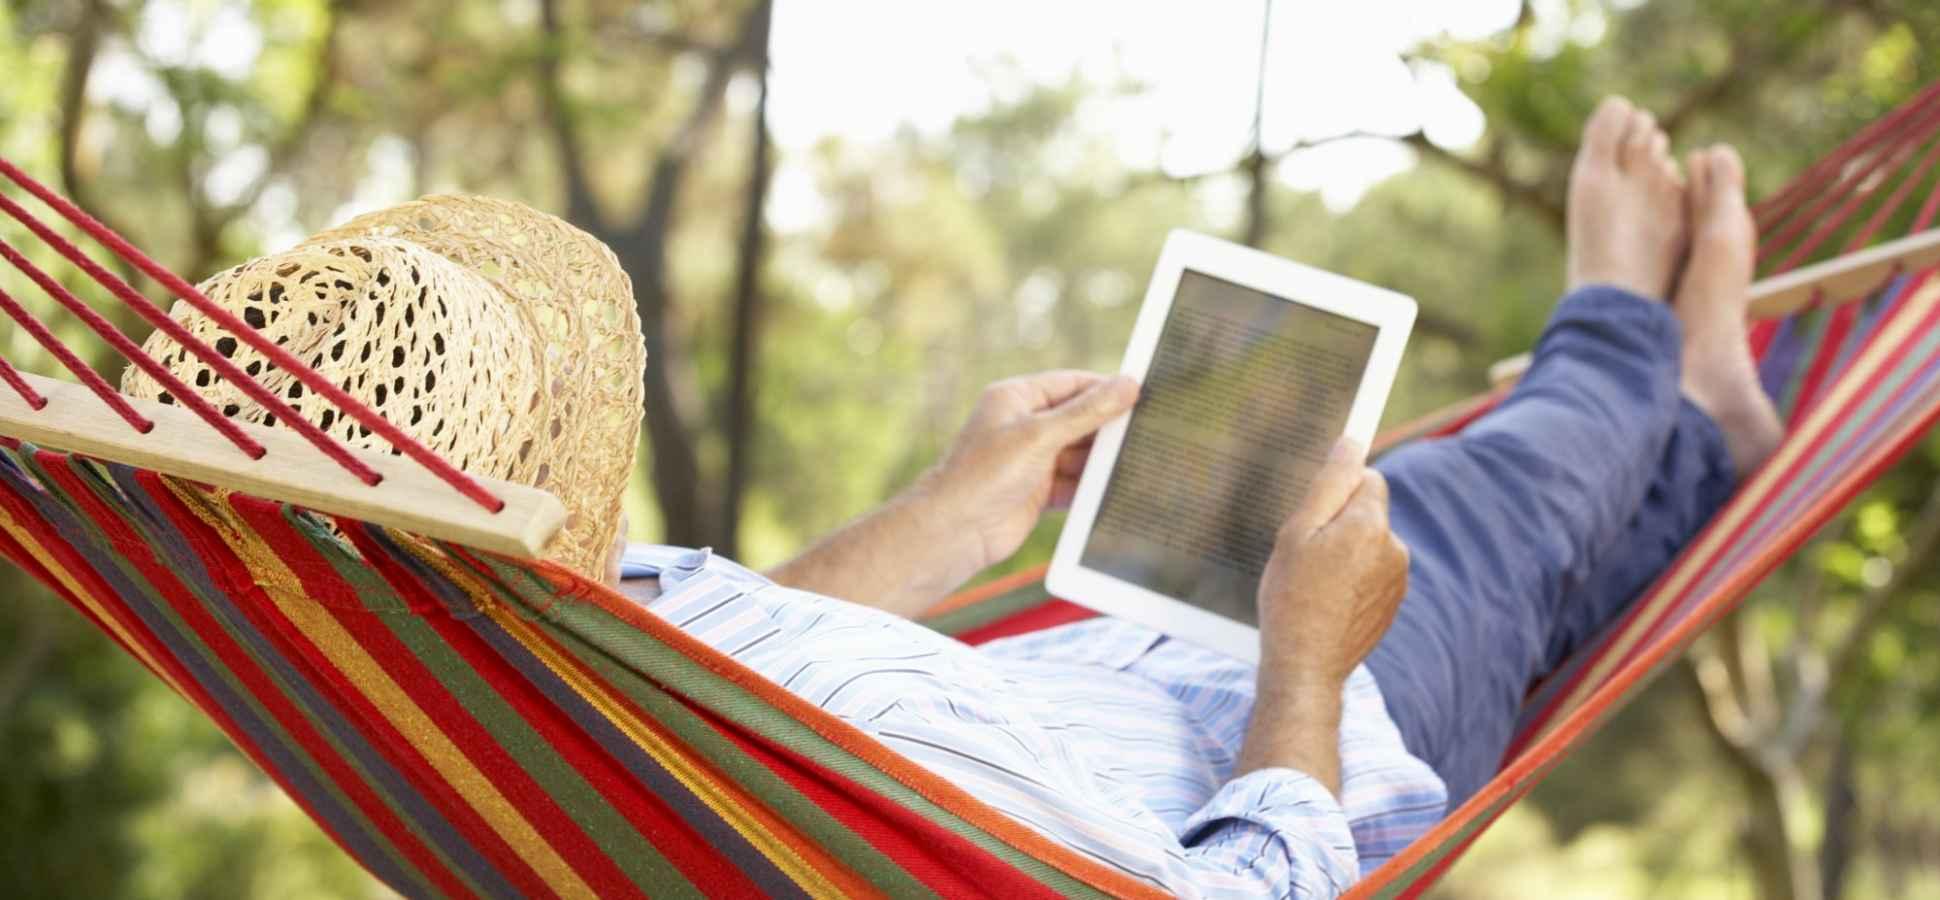 10 Entrepreneurs Share Their Summer Reading Lists